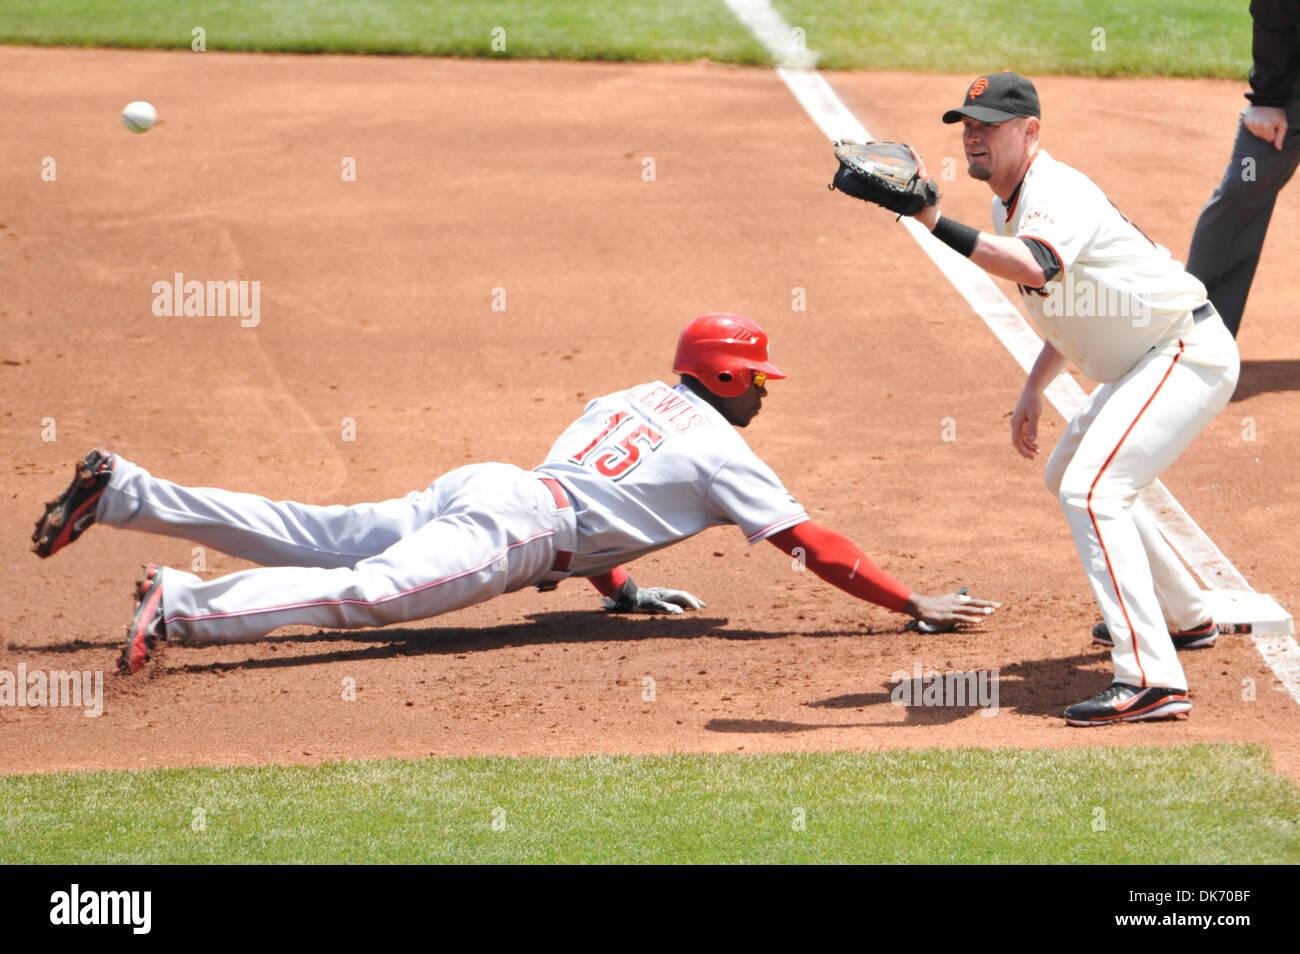 June 11, 2011 - San Francisco, California, U.S. - Cincinnati Reds center fielder FRED LEWIS (15) dives for first Stock Photo